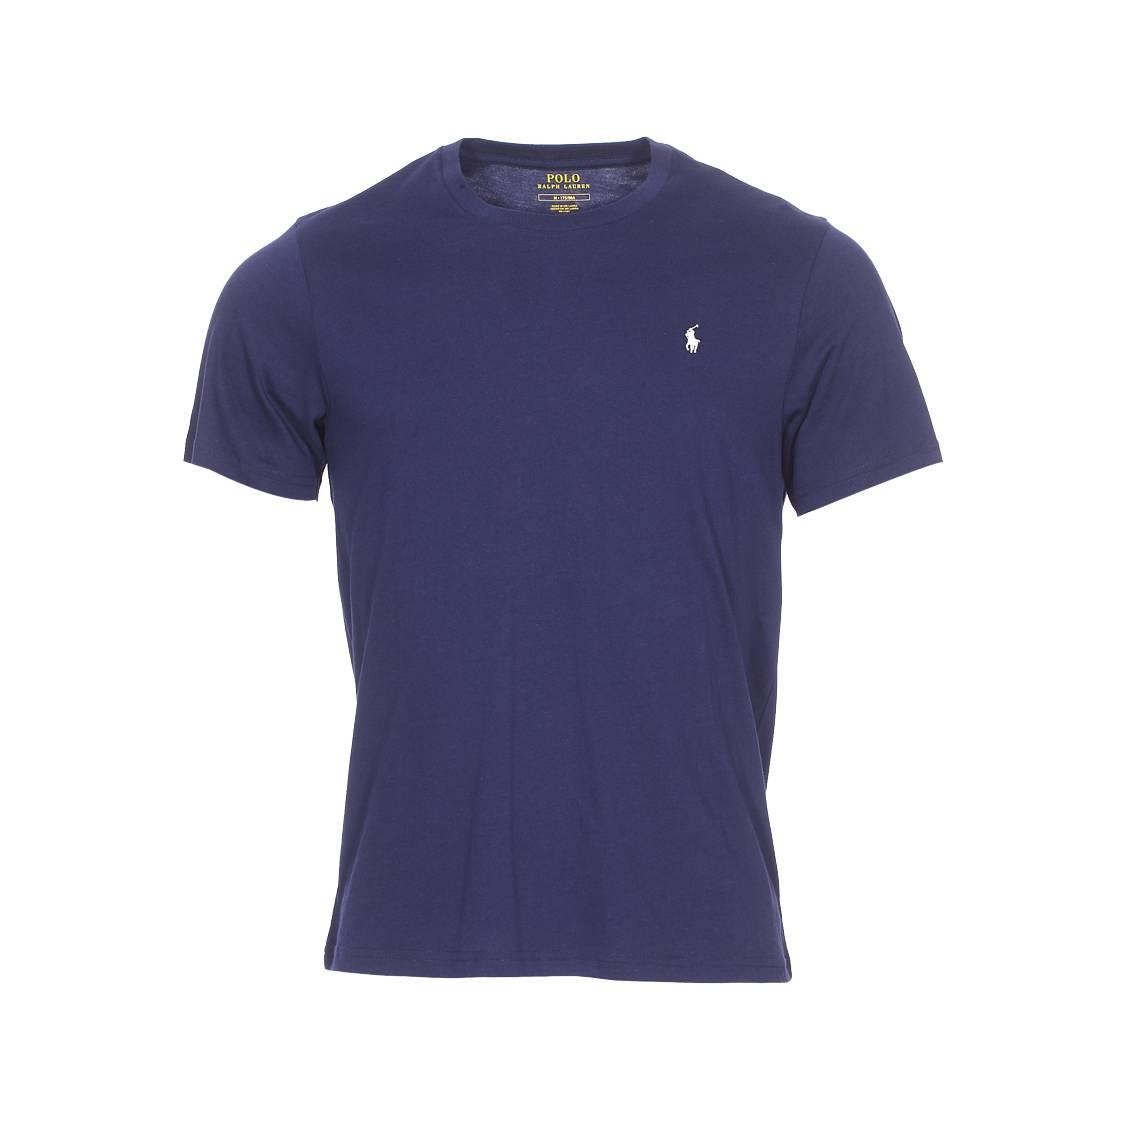 563d8d112a9 Tee-shirt col rond Polo Ralph Lauren en coton bleu marine à logo blanc  brodé ...